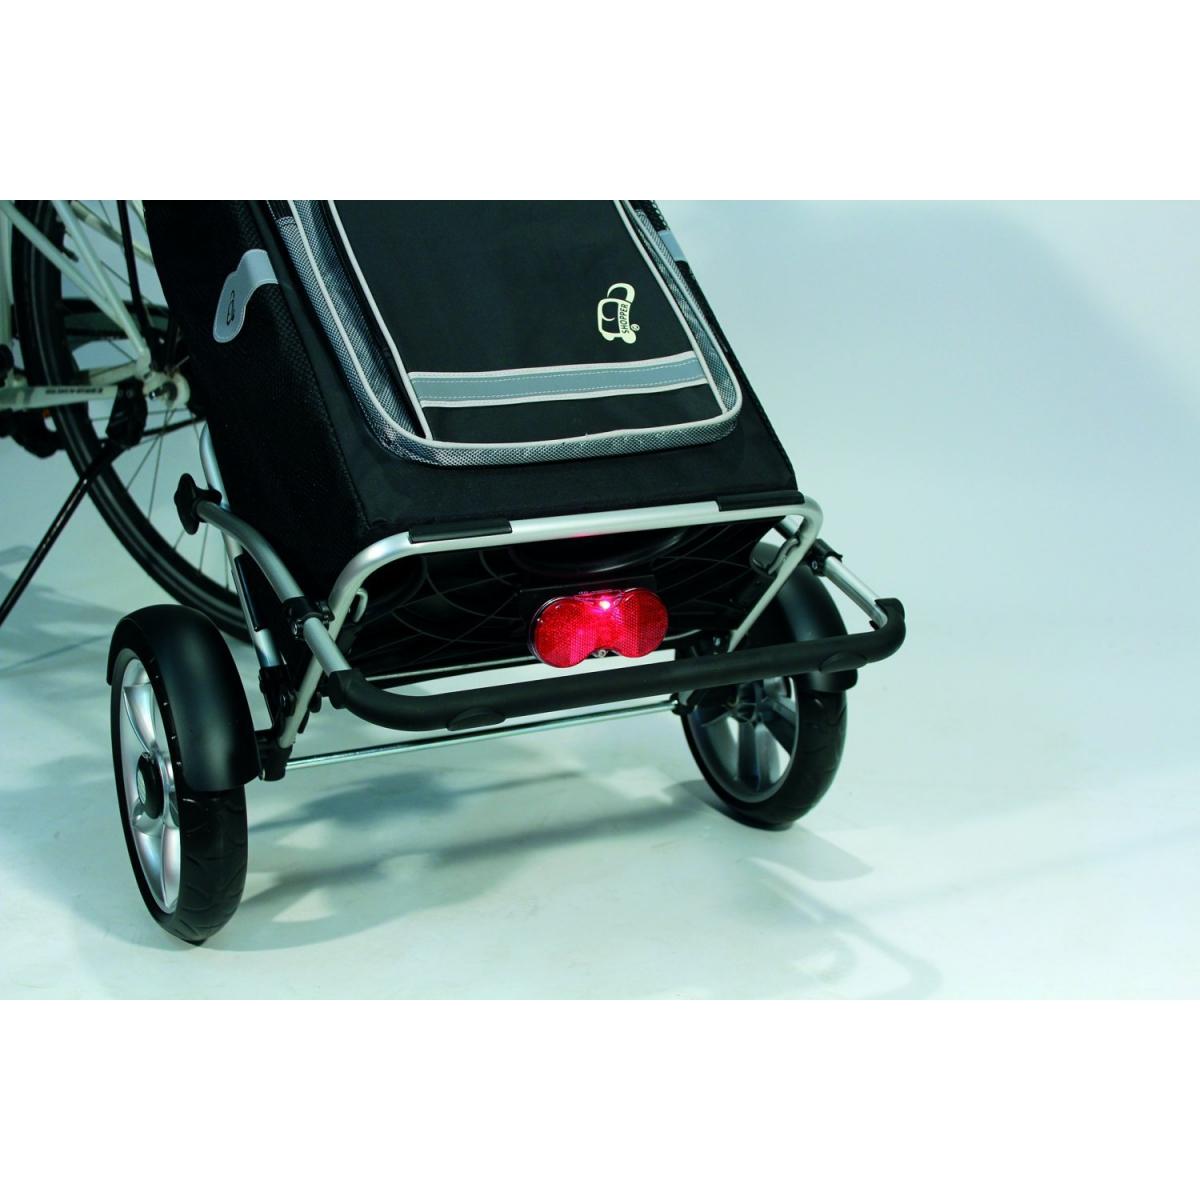 diodenr cklicht mit batterien fahrrad freizeitanh nger shopping. Black Bedroom Furniture Sets. Home Design Ideas